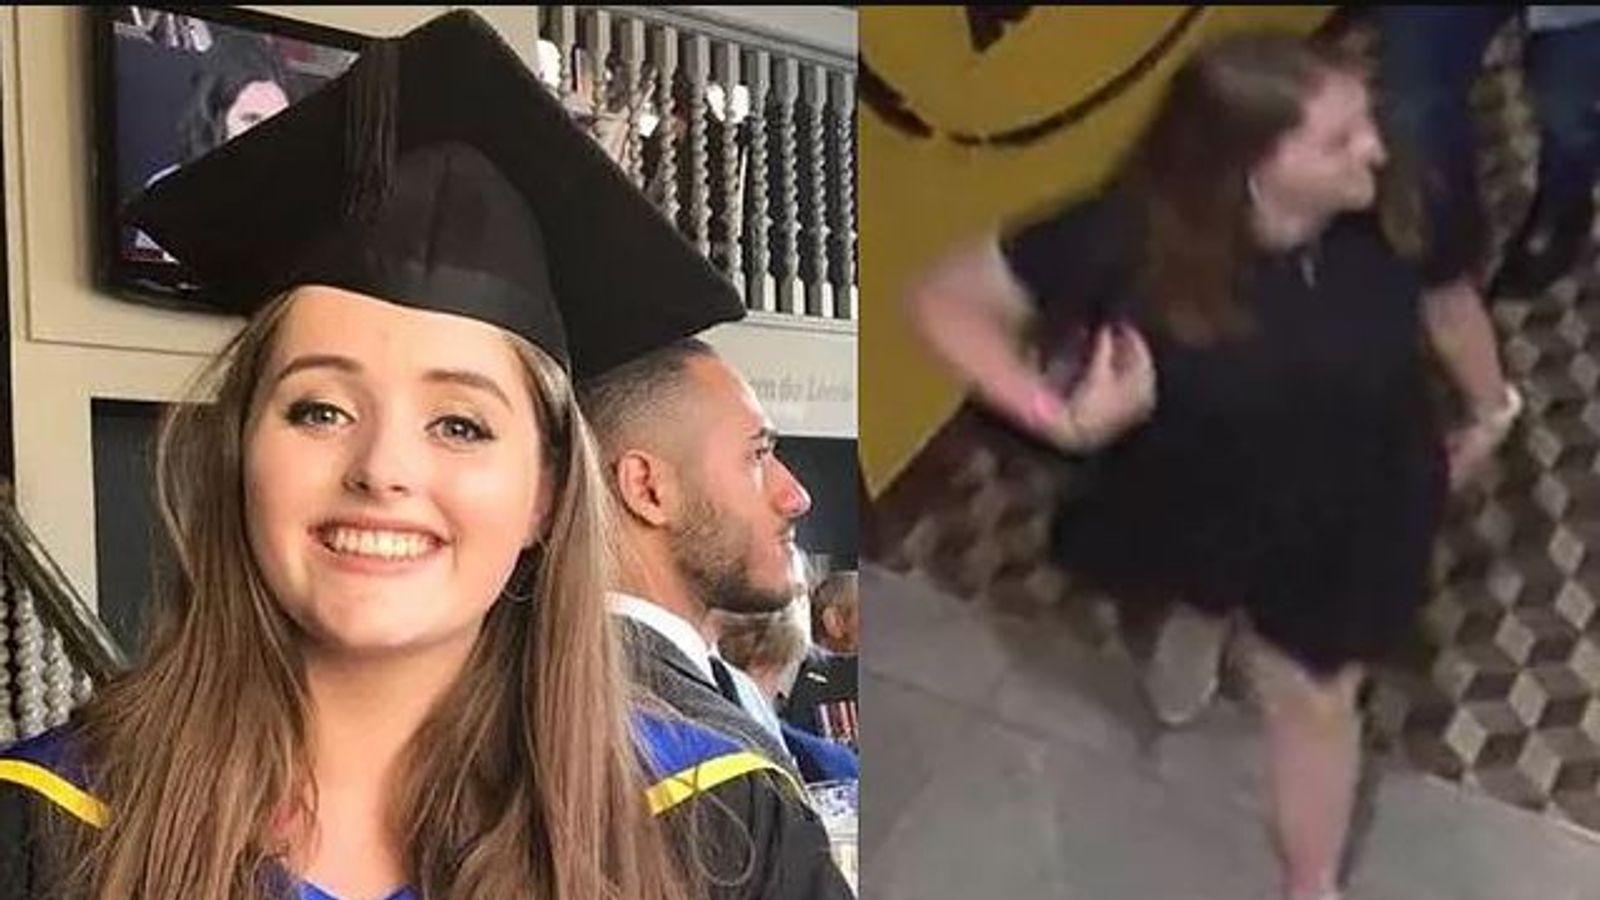 Man in court over murder of British backpacker Grace Millane